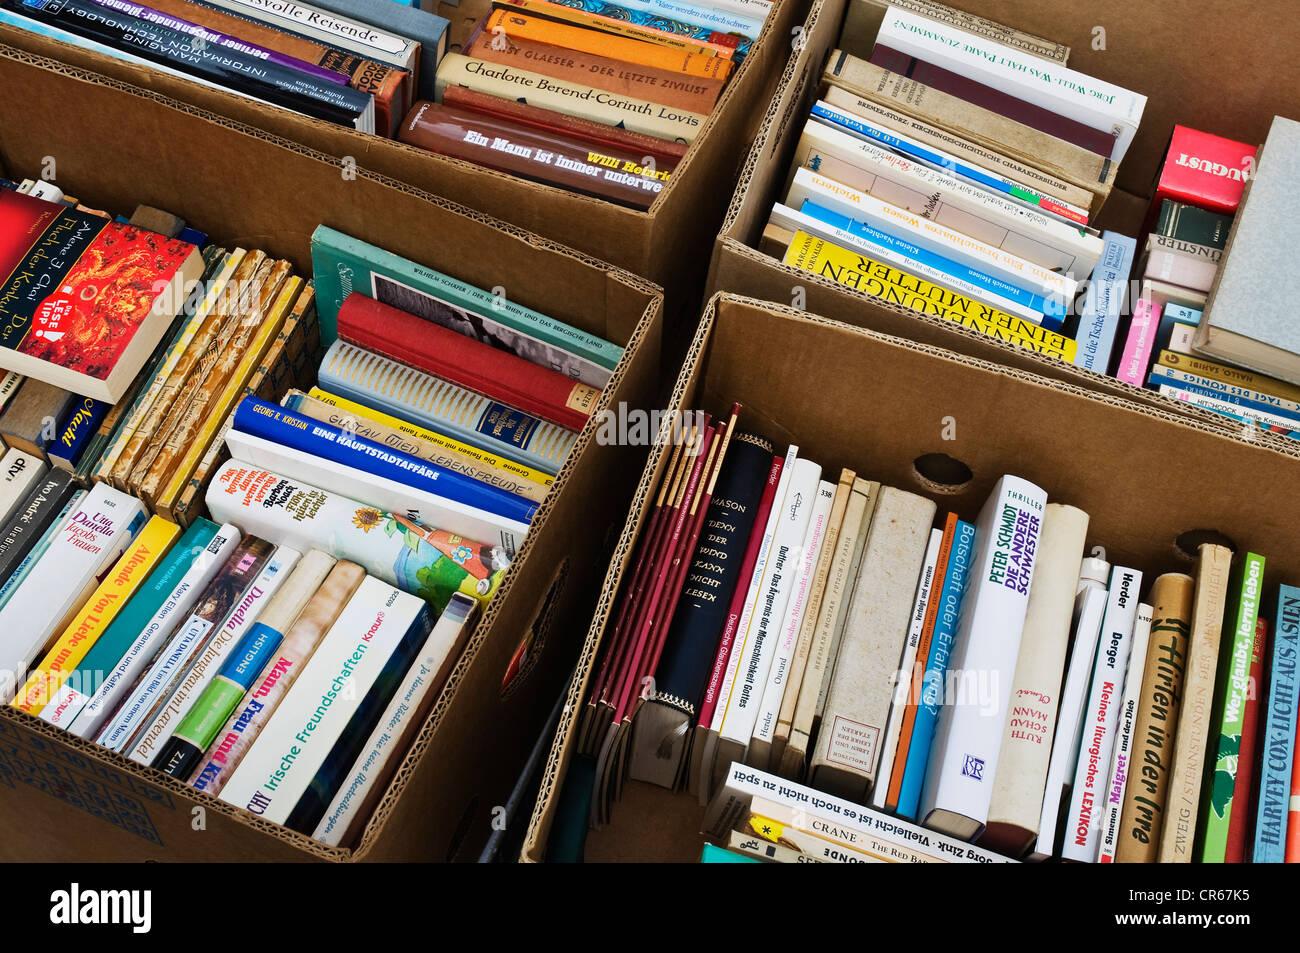 Book flea market, boxes of fiction books, PublicGround - Stock Image